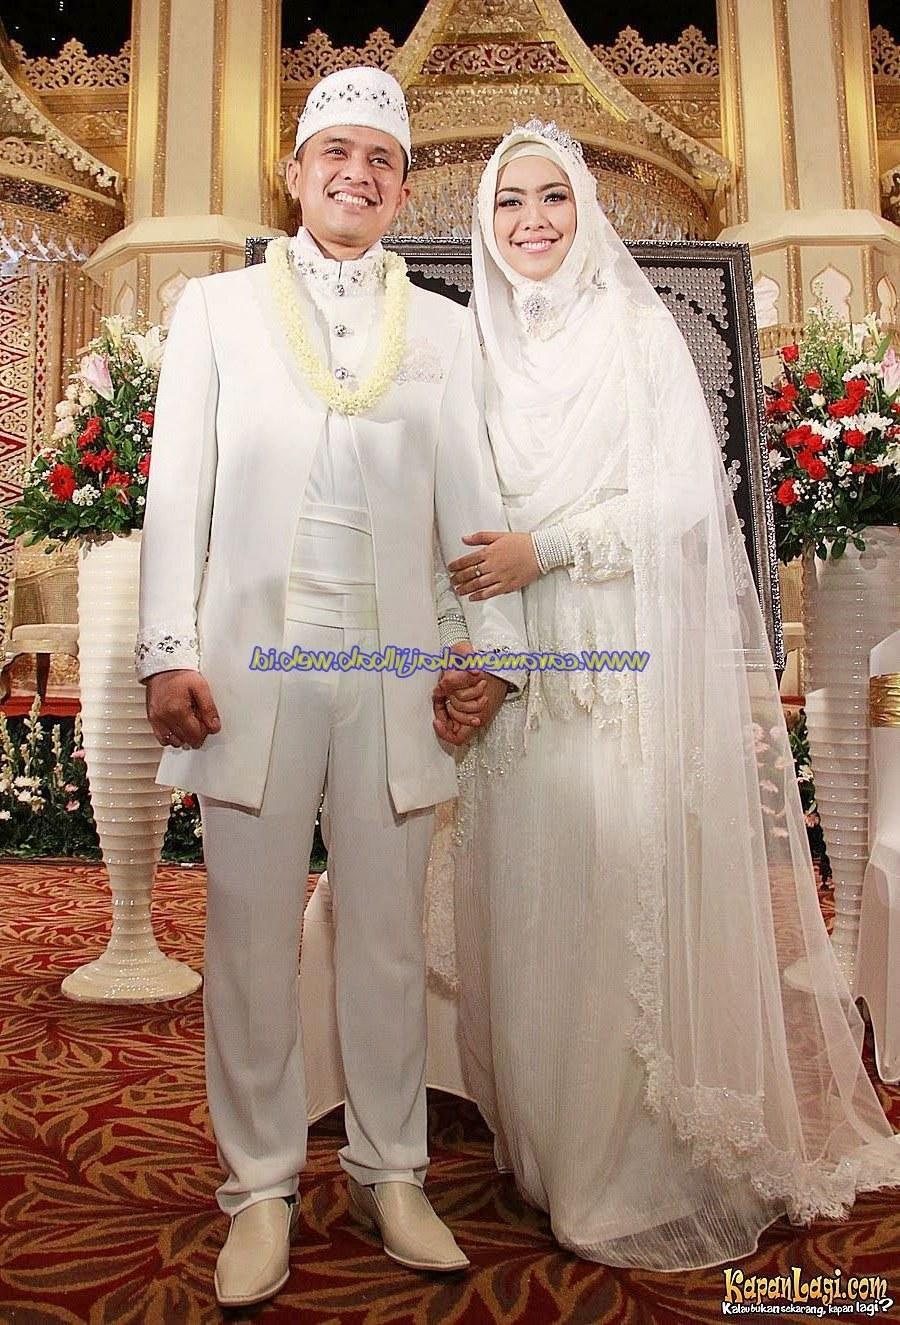 Model Baju Pengantin Muslimah Syar'i Kebaya Budm Baju Pengantin Muslimah Modern Terbaru 17